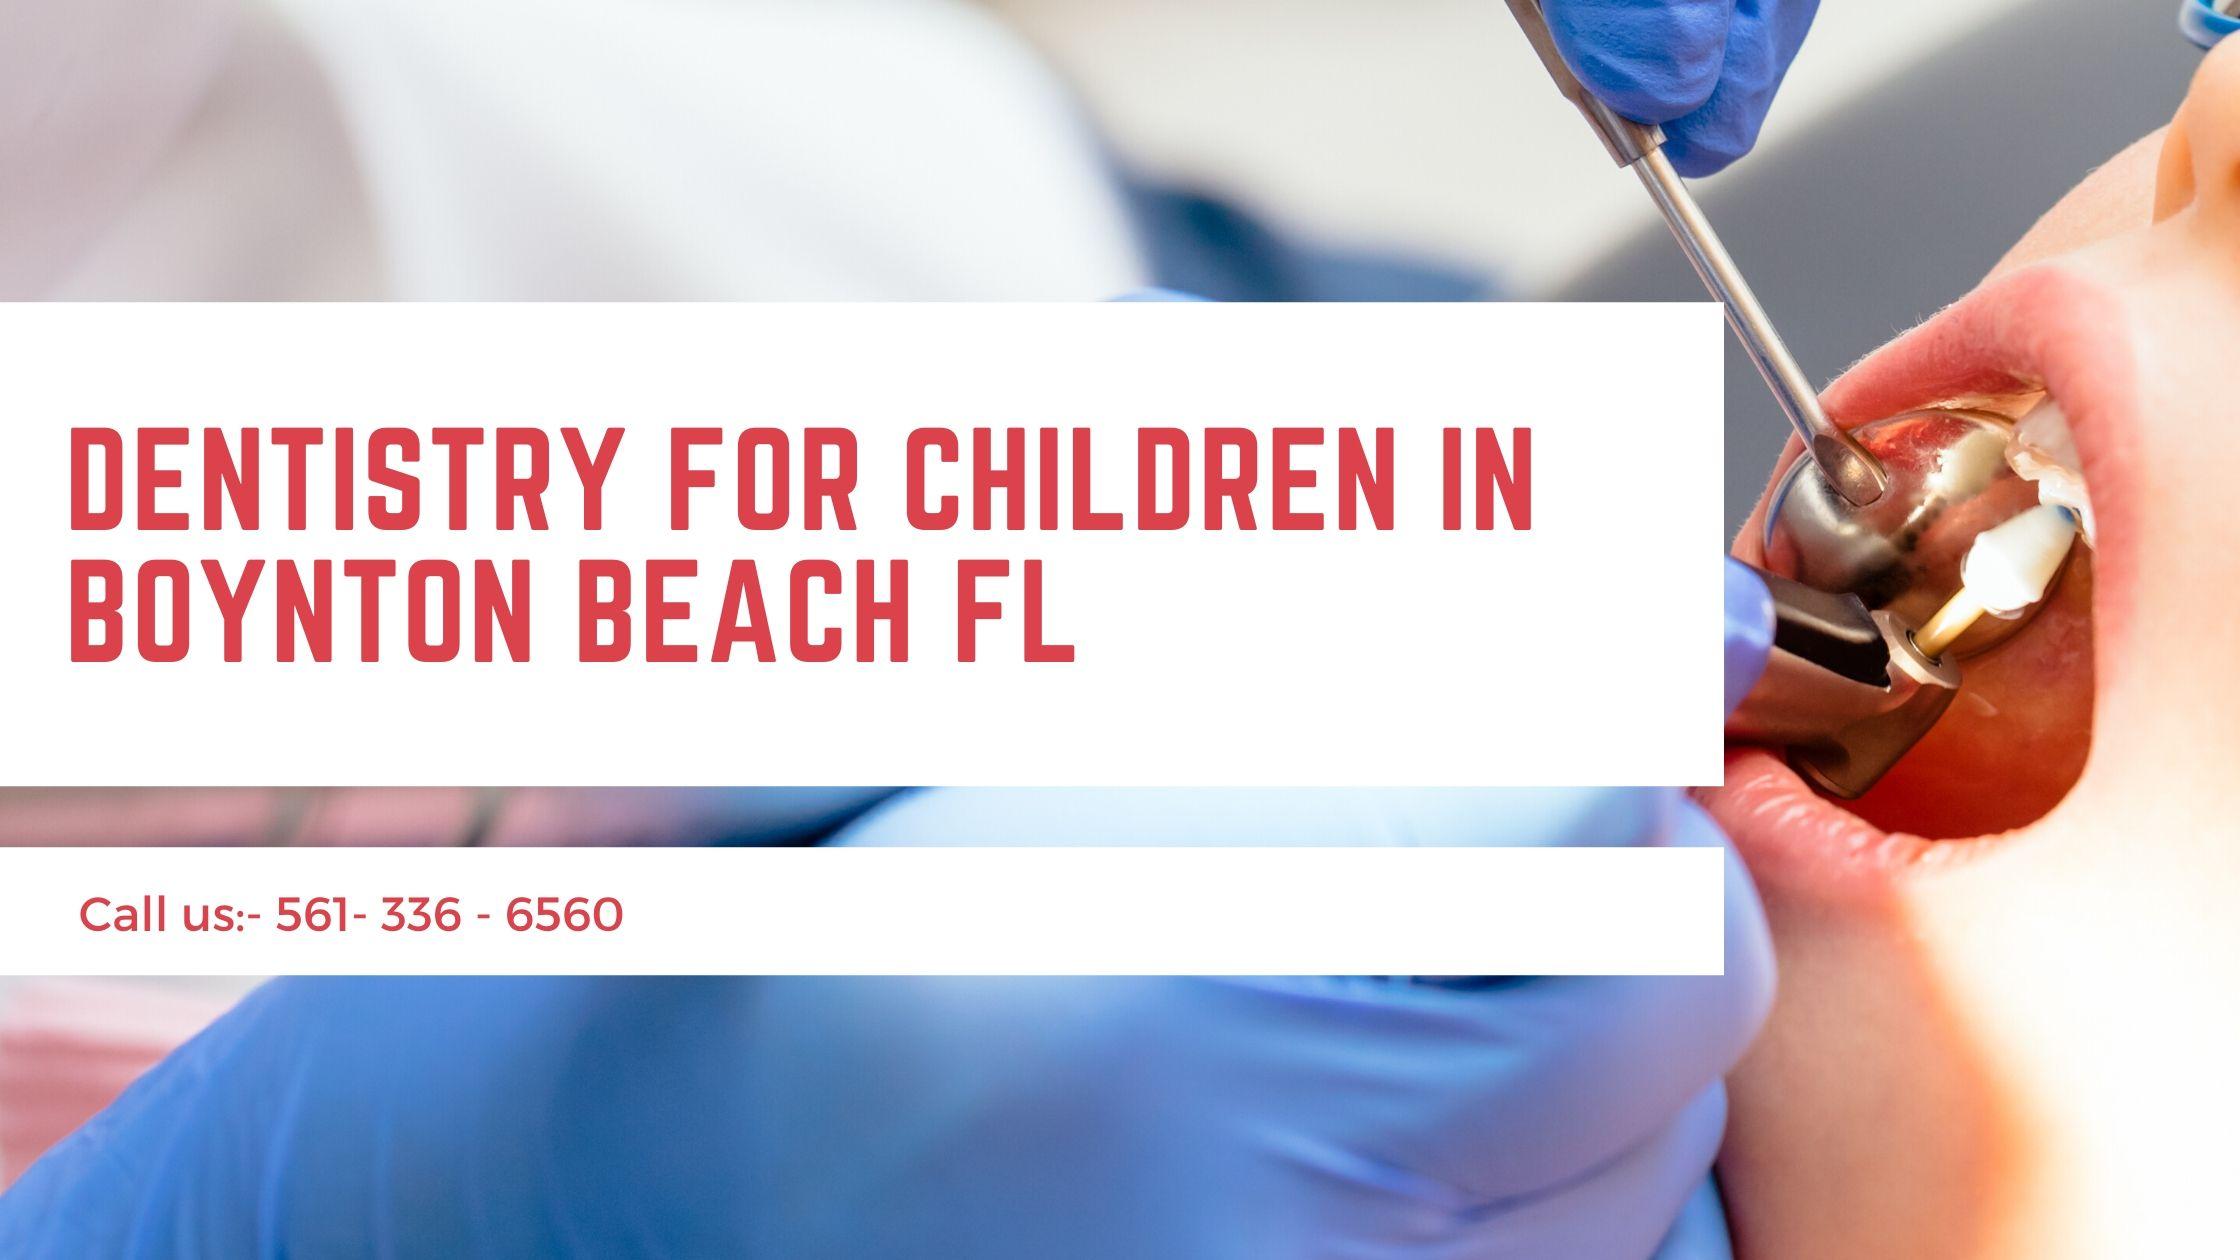 Dentistry For Children In Boynton Beach FL in 2020